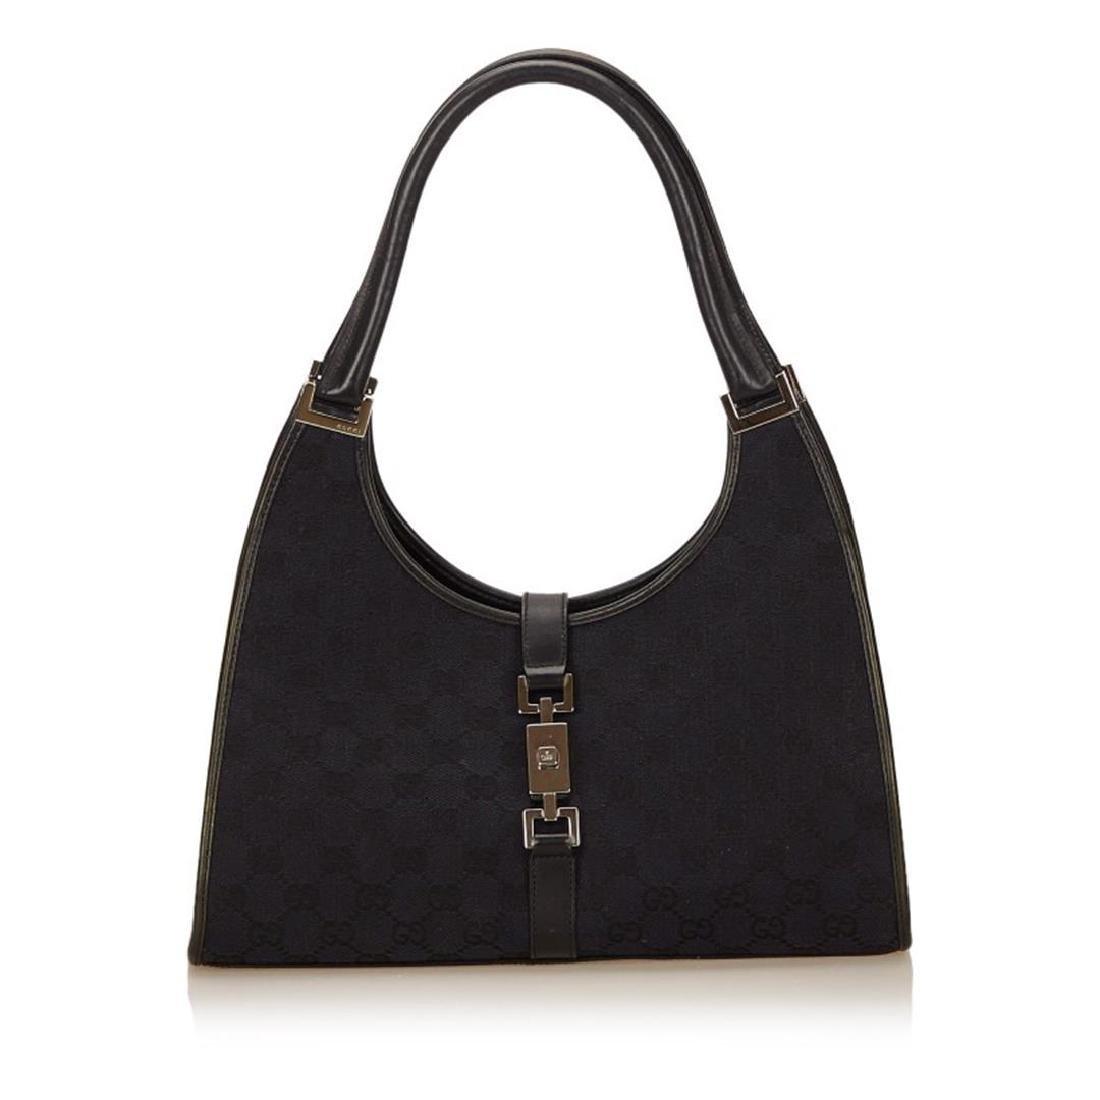 Gucci Black Canvas Jacquard Leather Trim Jackie Bag